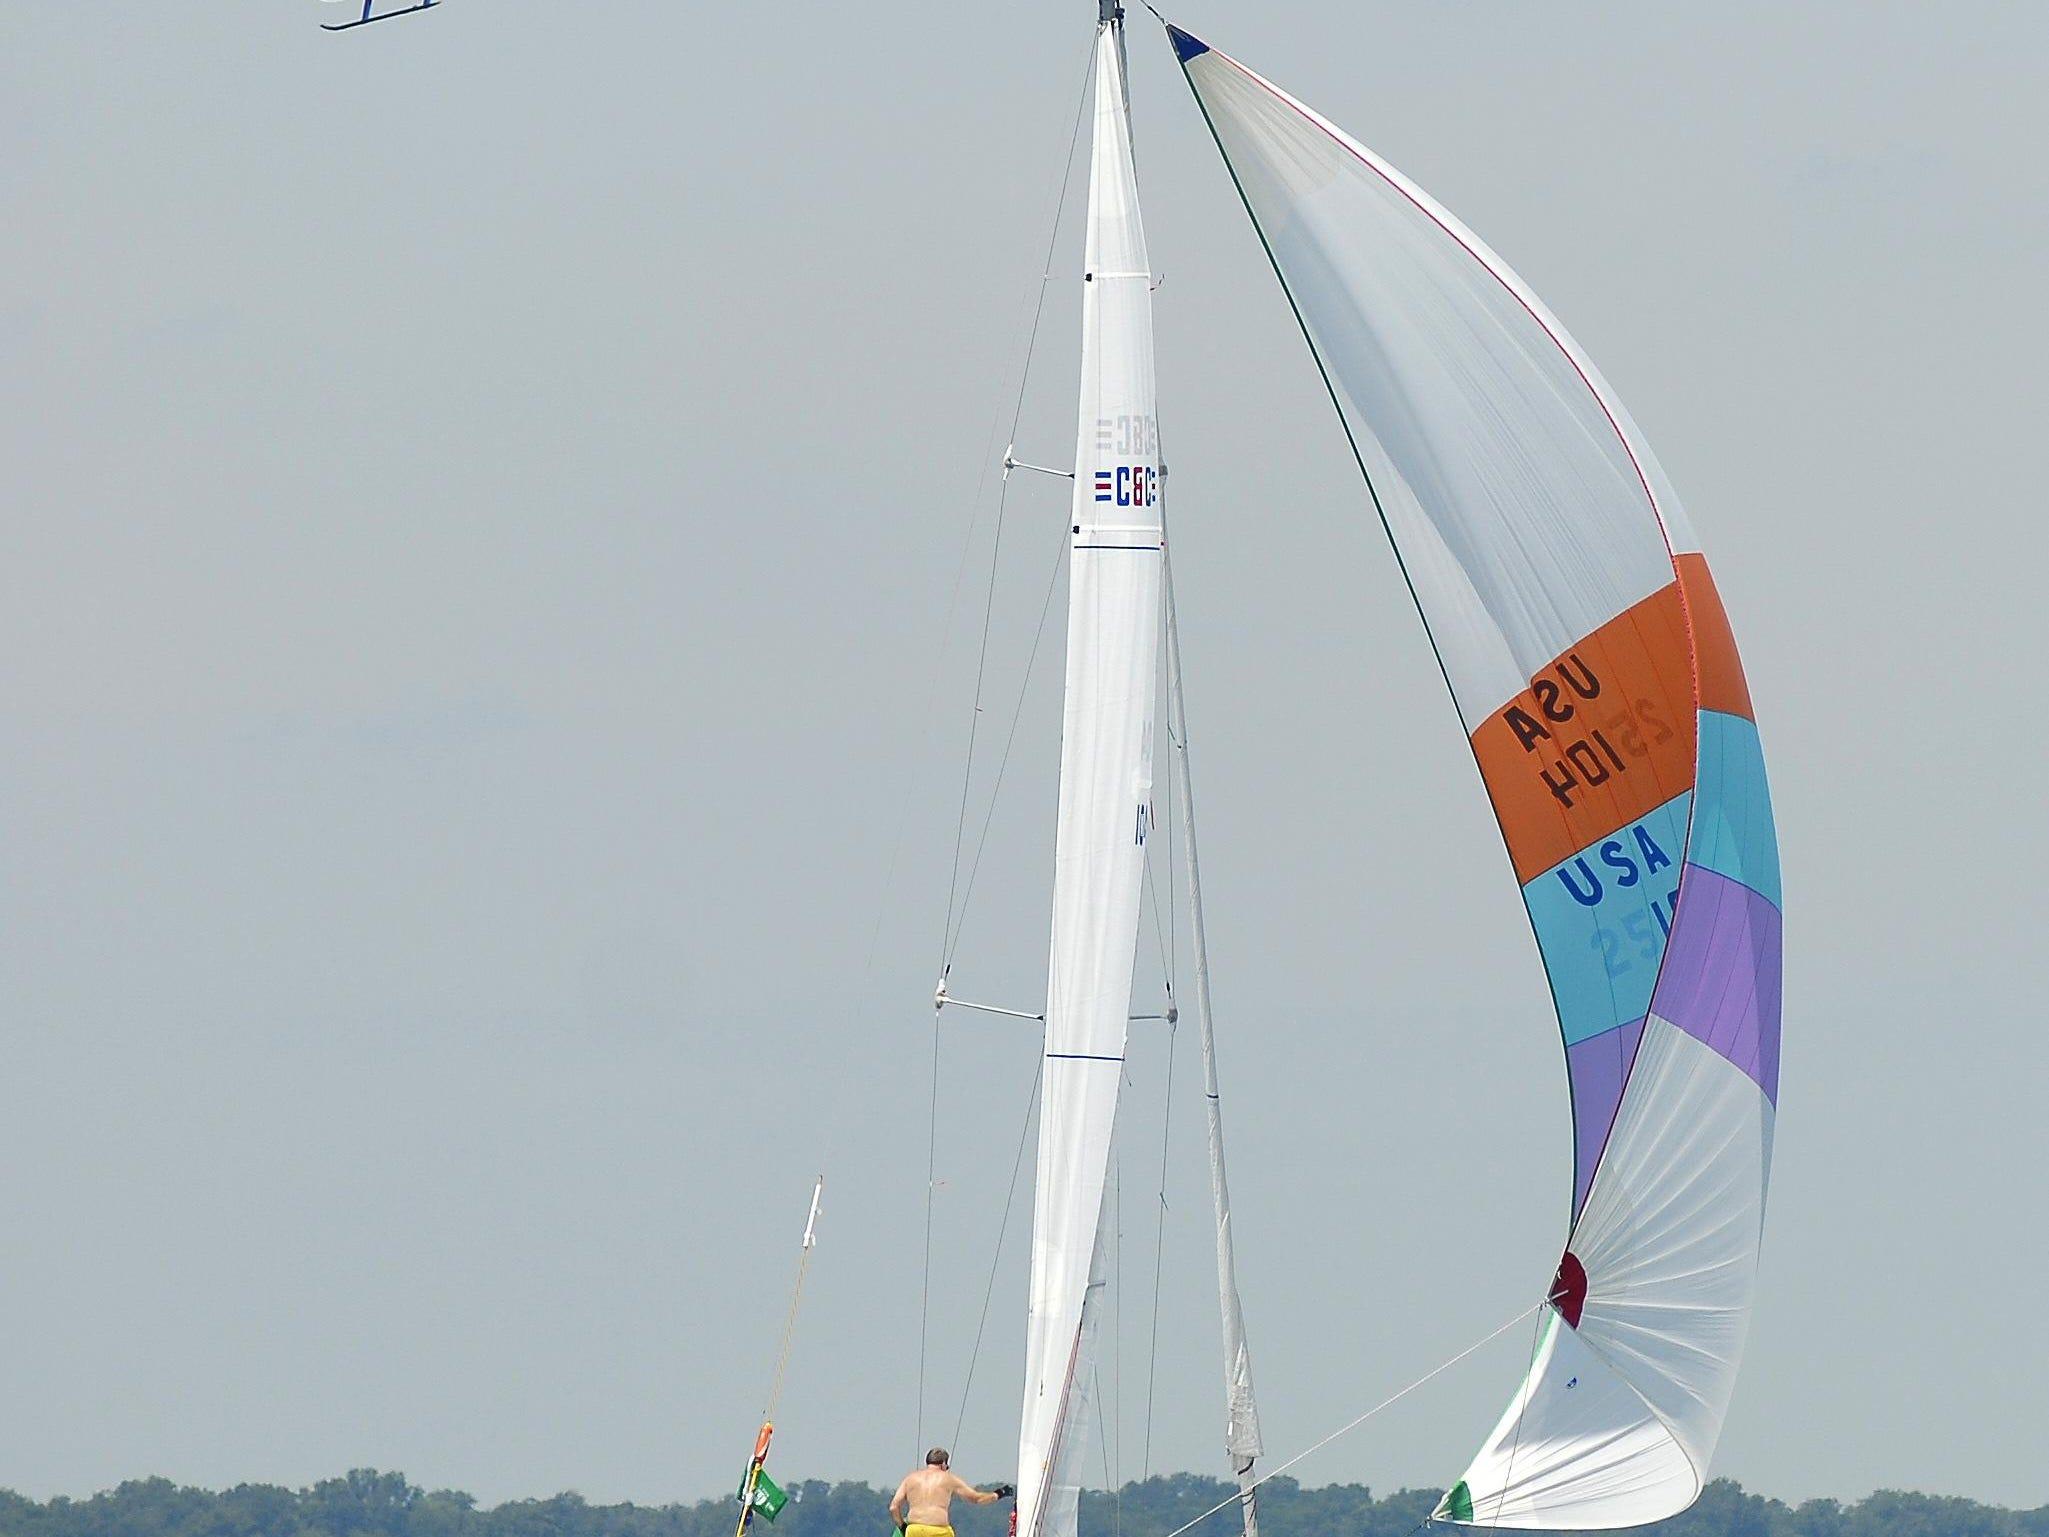 Mattali, of the Port Huron Yacht Club